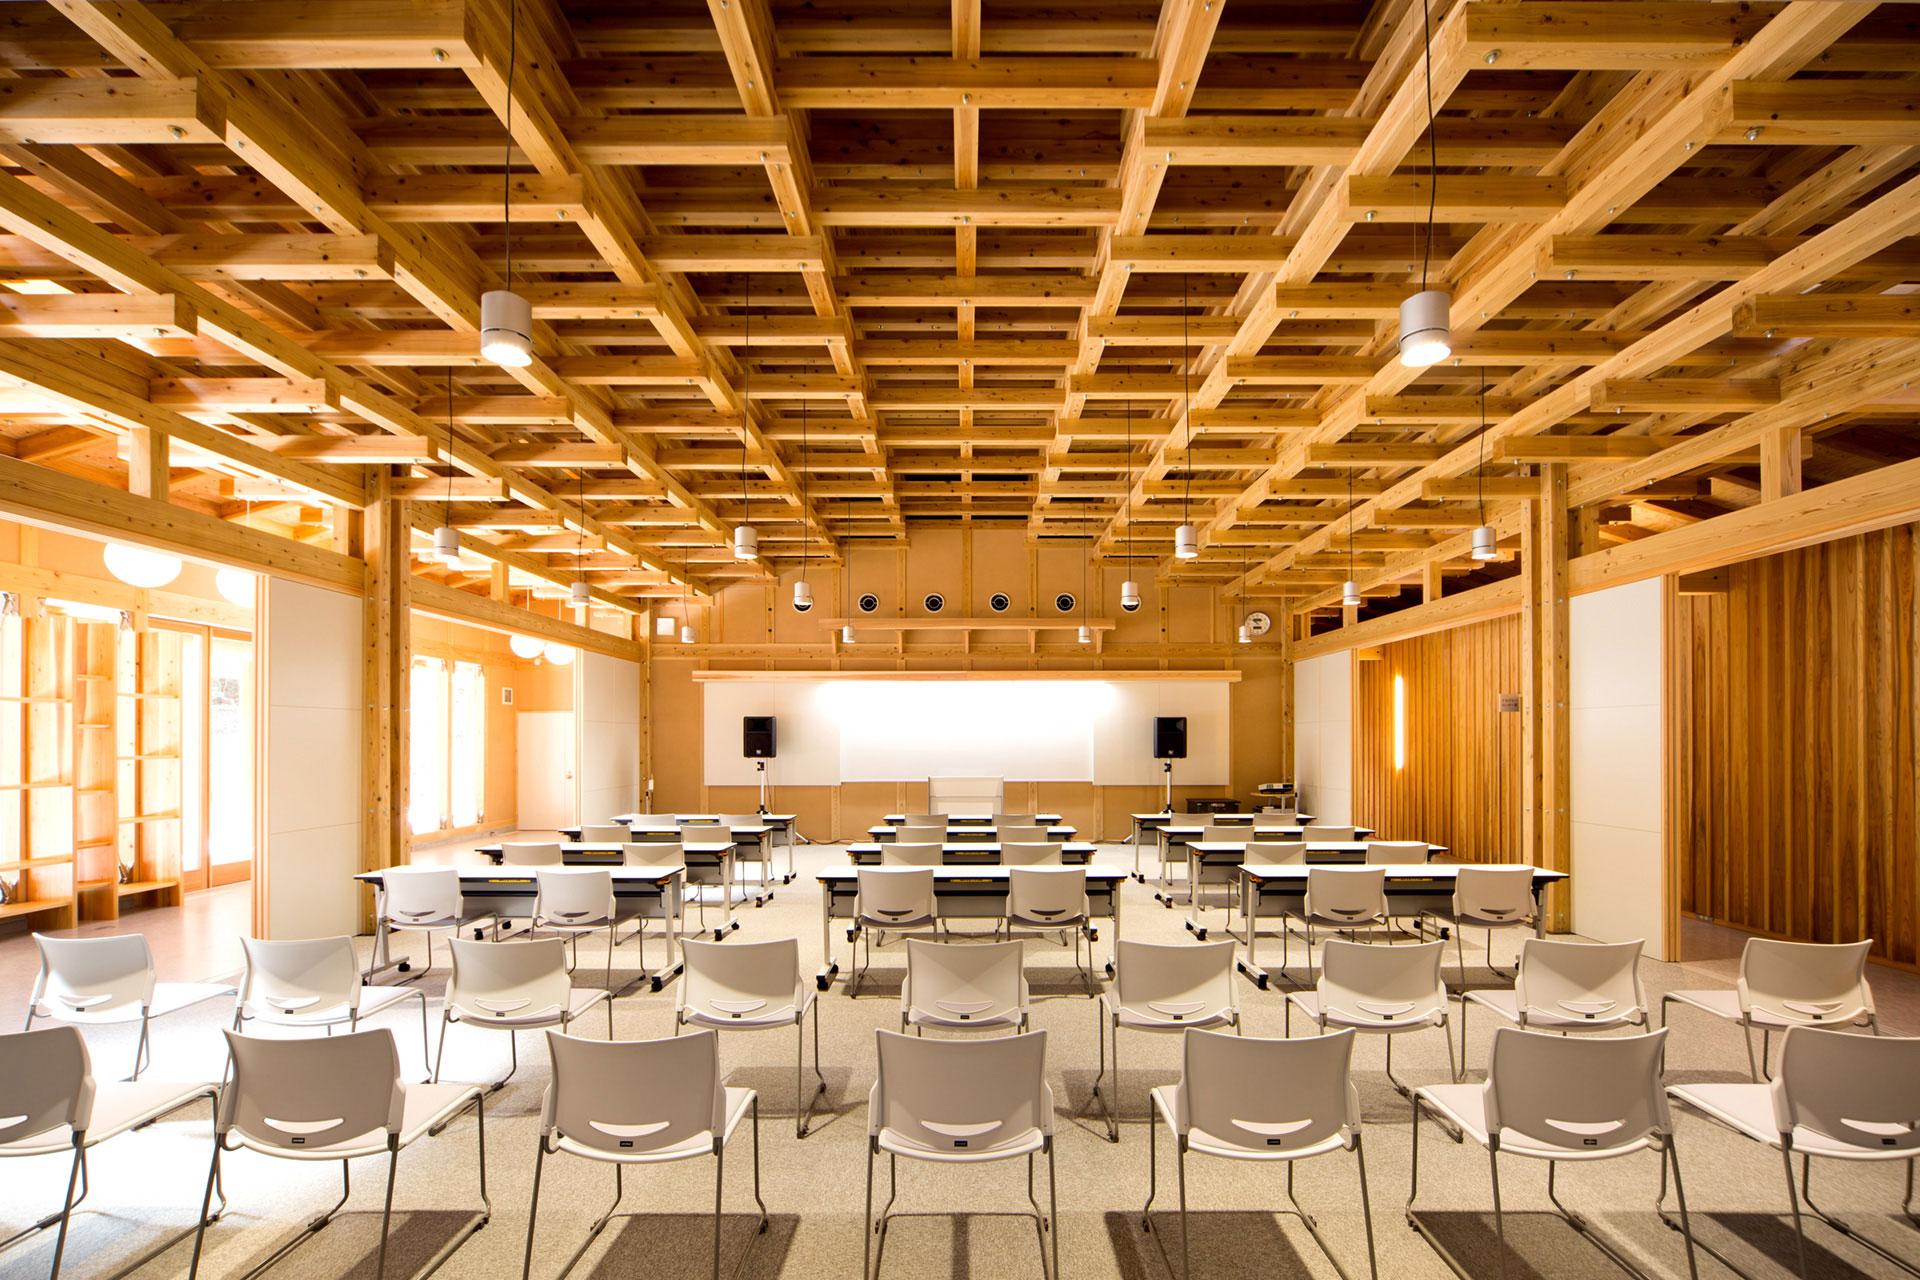 木材利用創造センター林業人材育成棟